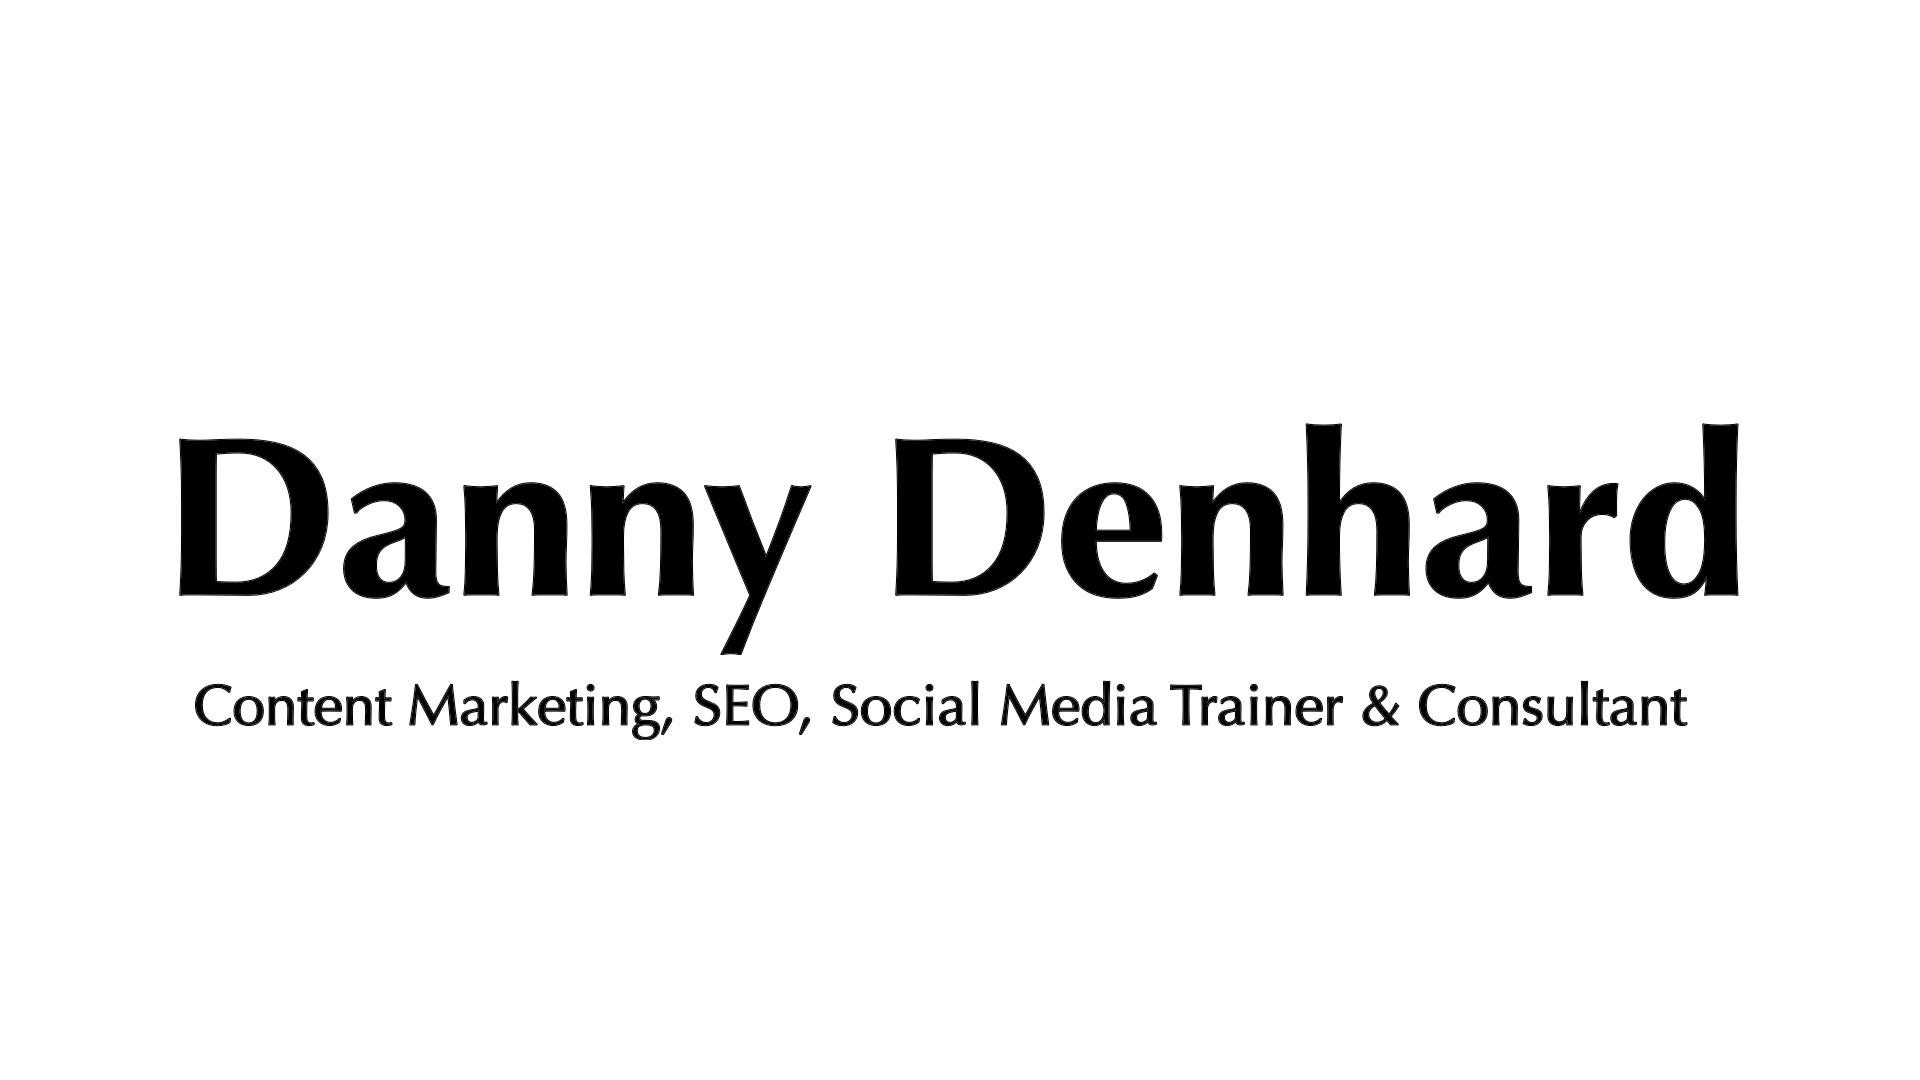 Danny Denhard